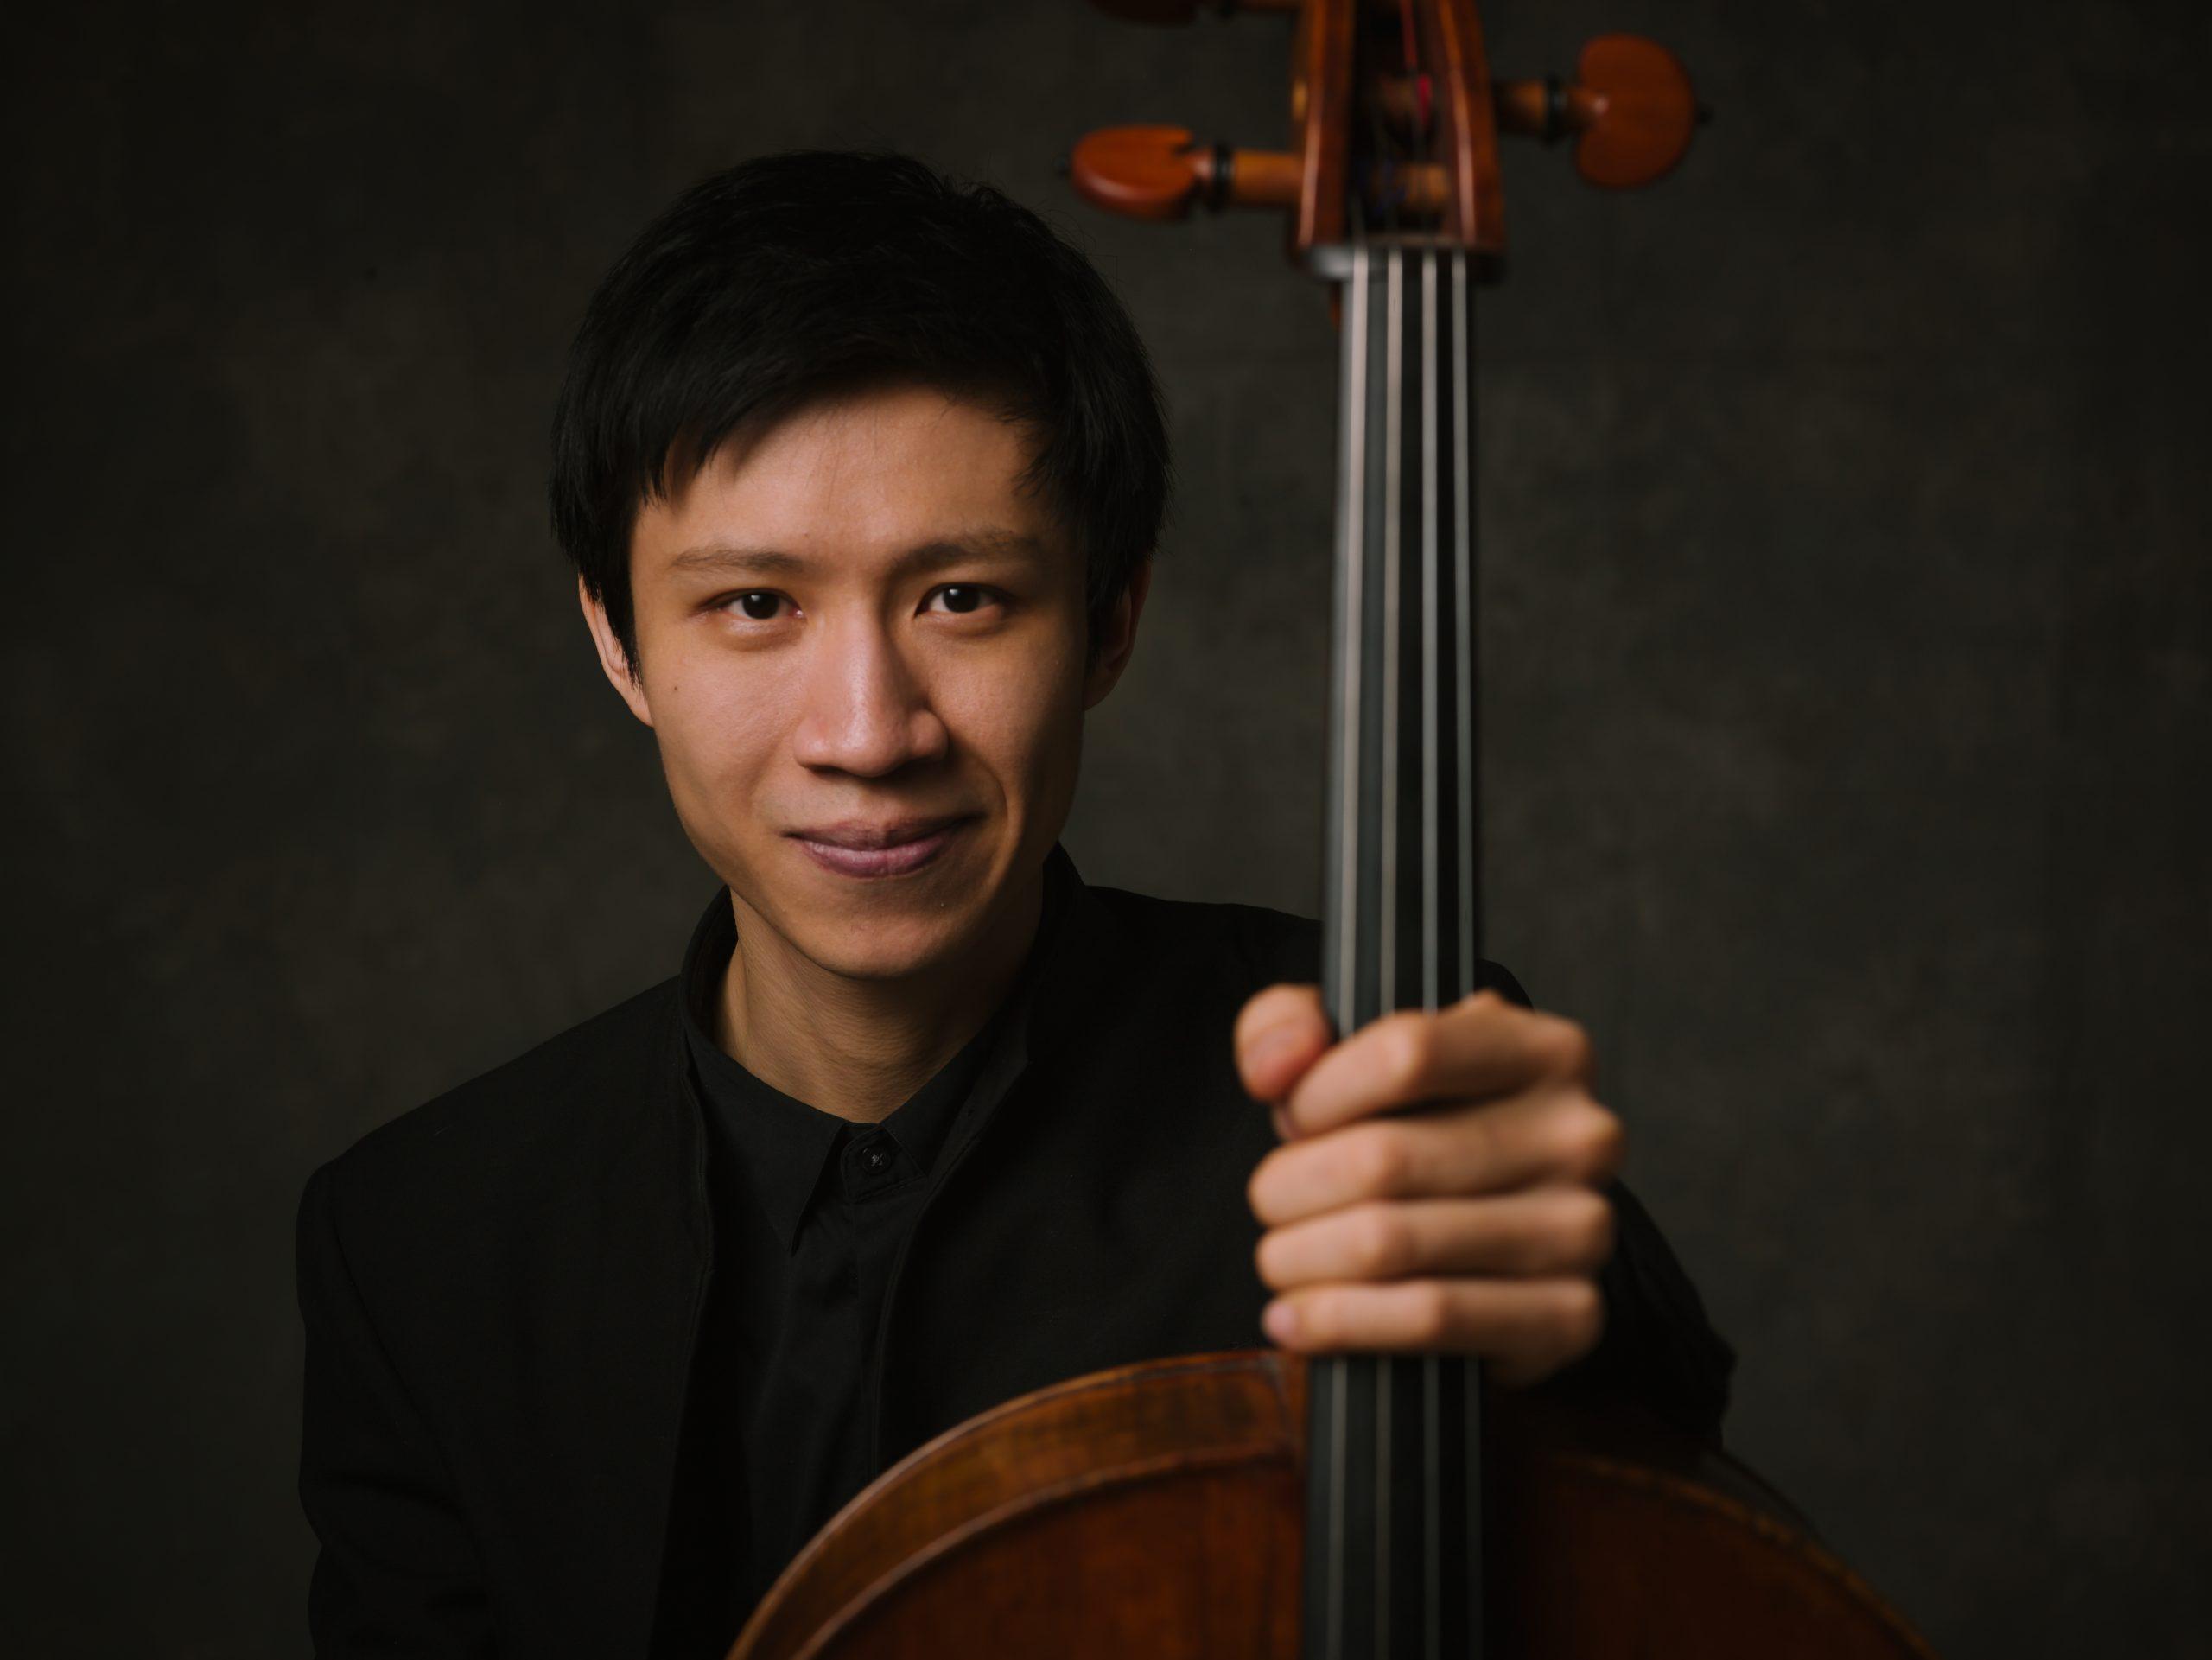 Yang Yichen